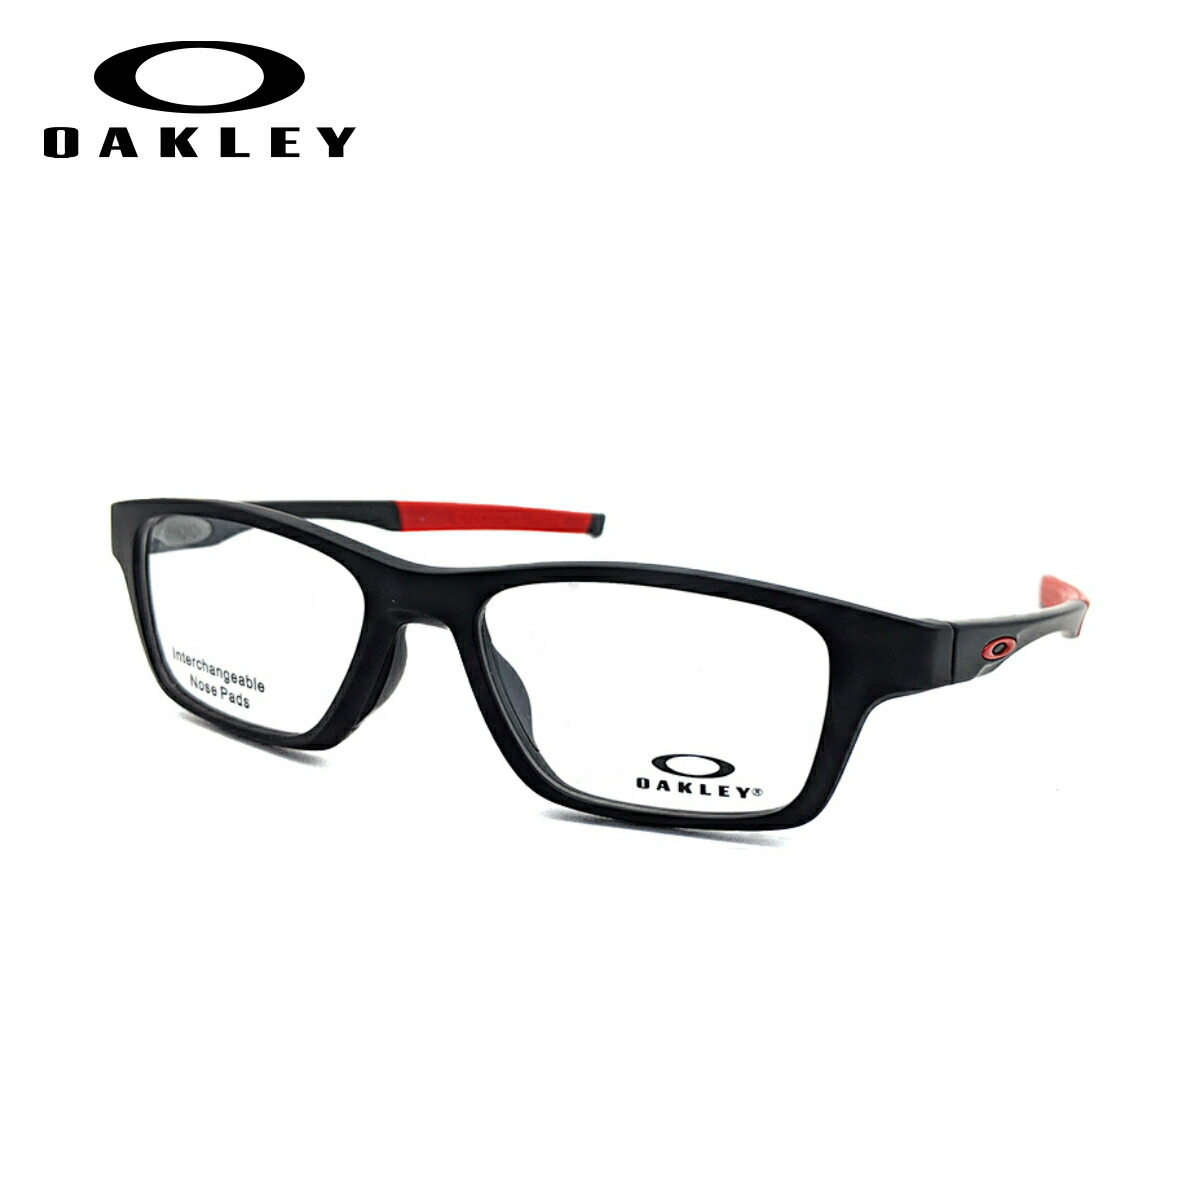 OAKLEY CROSSLINK HIGH POWER オークリー クロスリンク ハイパワー メガネ フレーム OX8117-01 52サイズ 度付き対応 近視 強度 度数 強い スポーツ オプサルミック 眼鏡 フレーム 軽い 軽量 丈夫 男性 メンズ 女性 レディース 【送料無料】